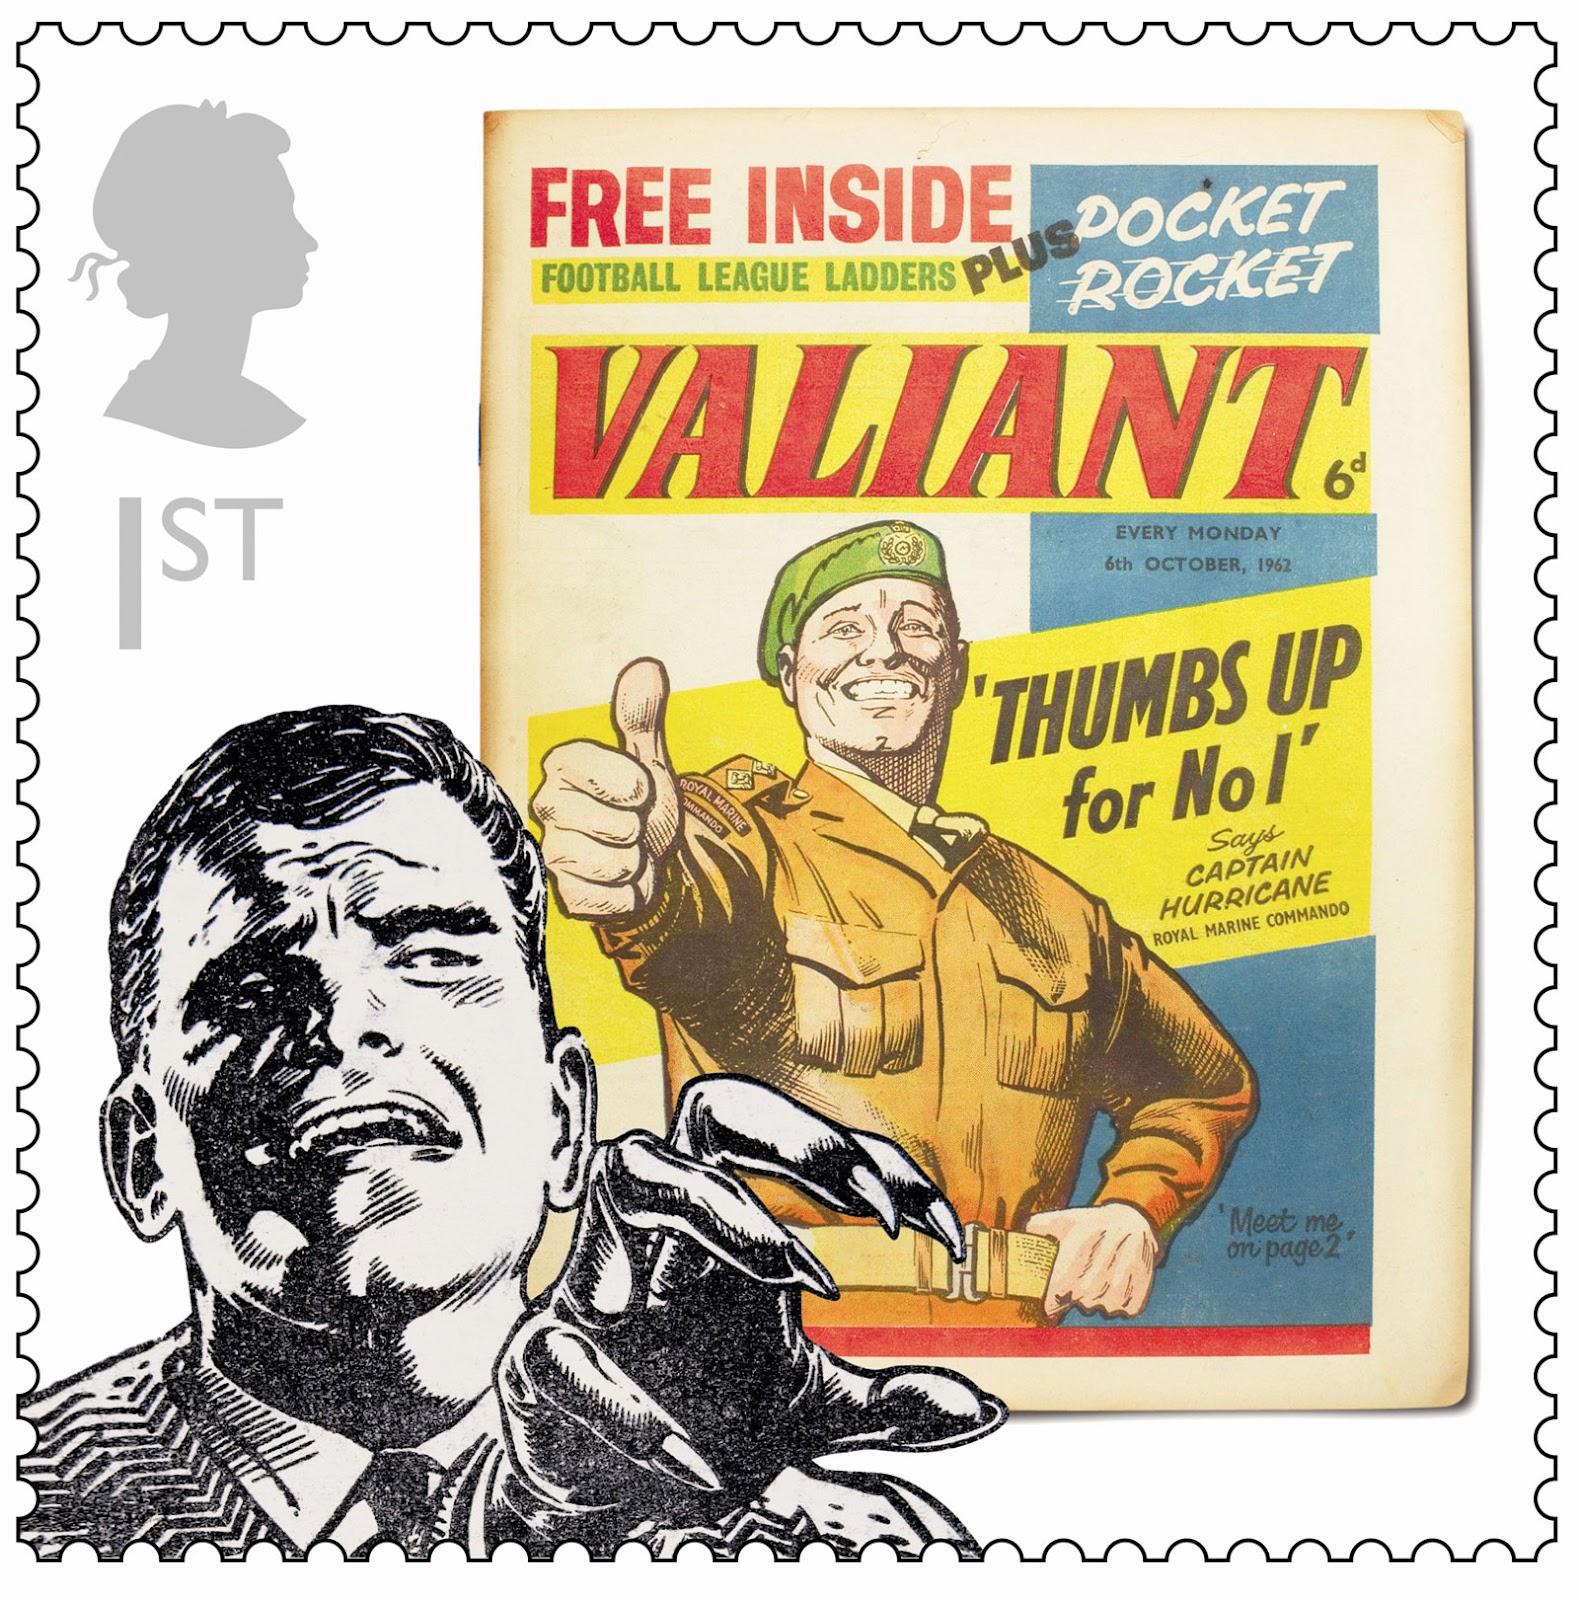 Royal Mail Comic Stamp - Valiant